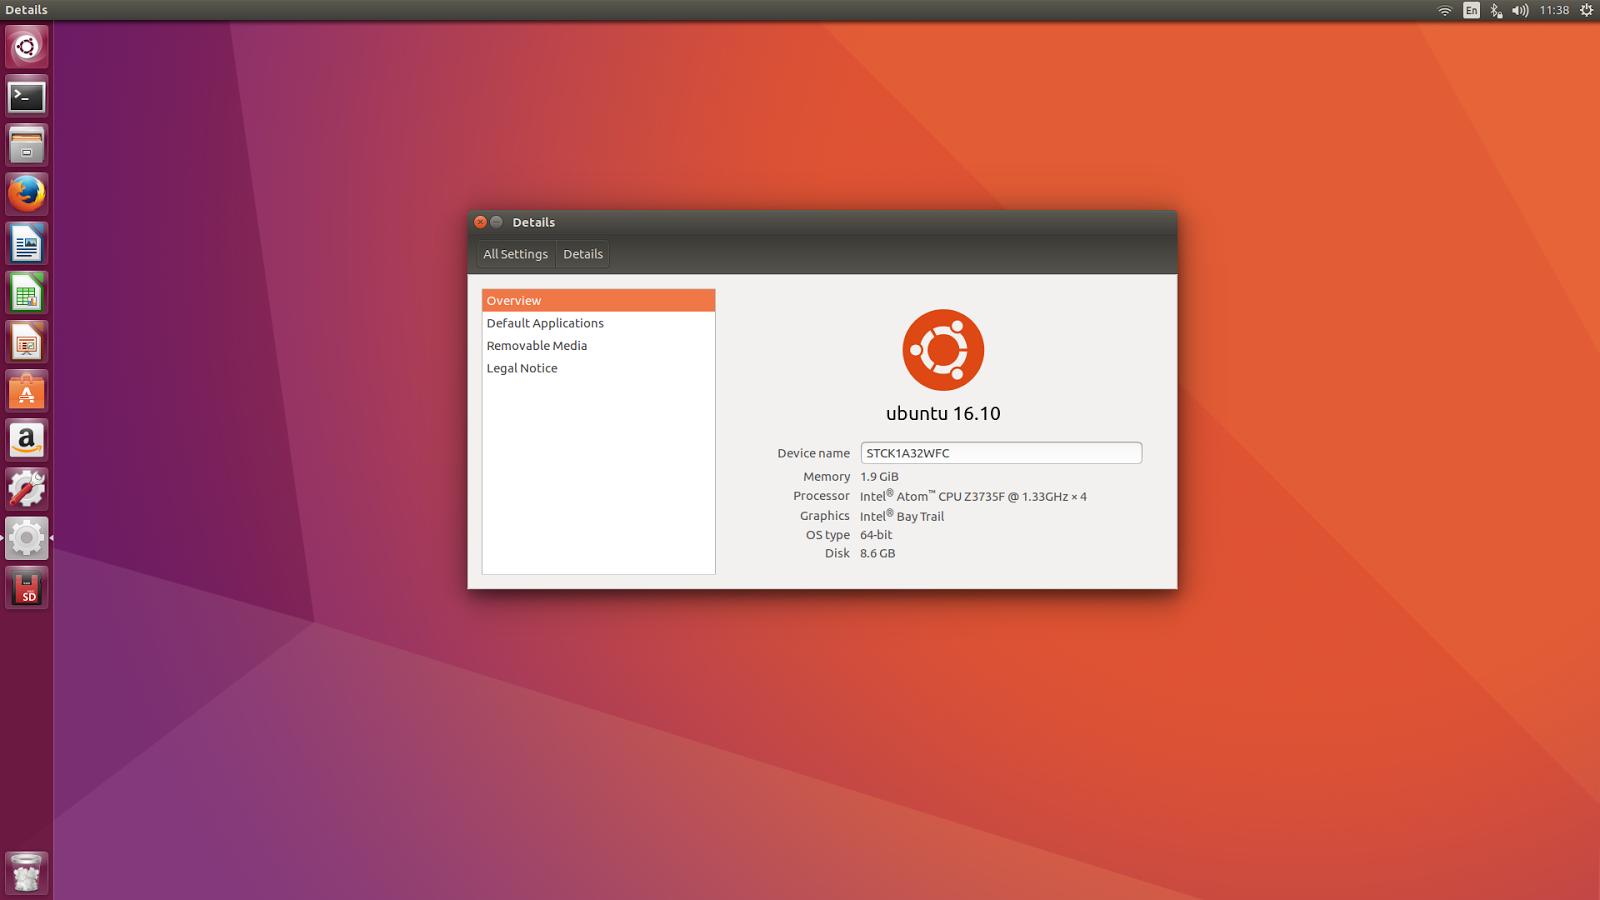 linuxium com au: Running Ubuntu on Intel Bay Trail and Cherry Trail